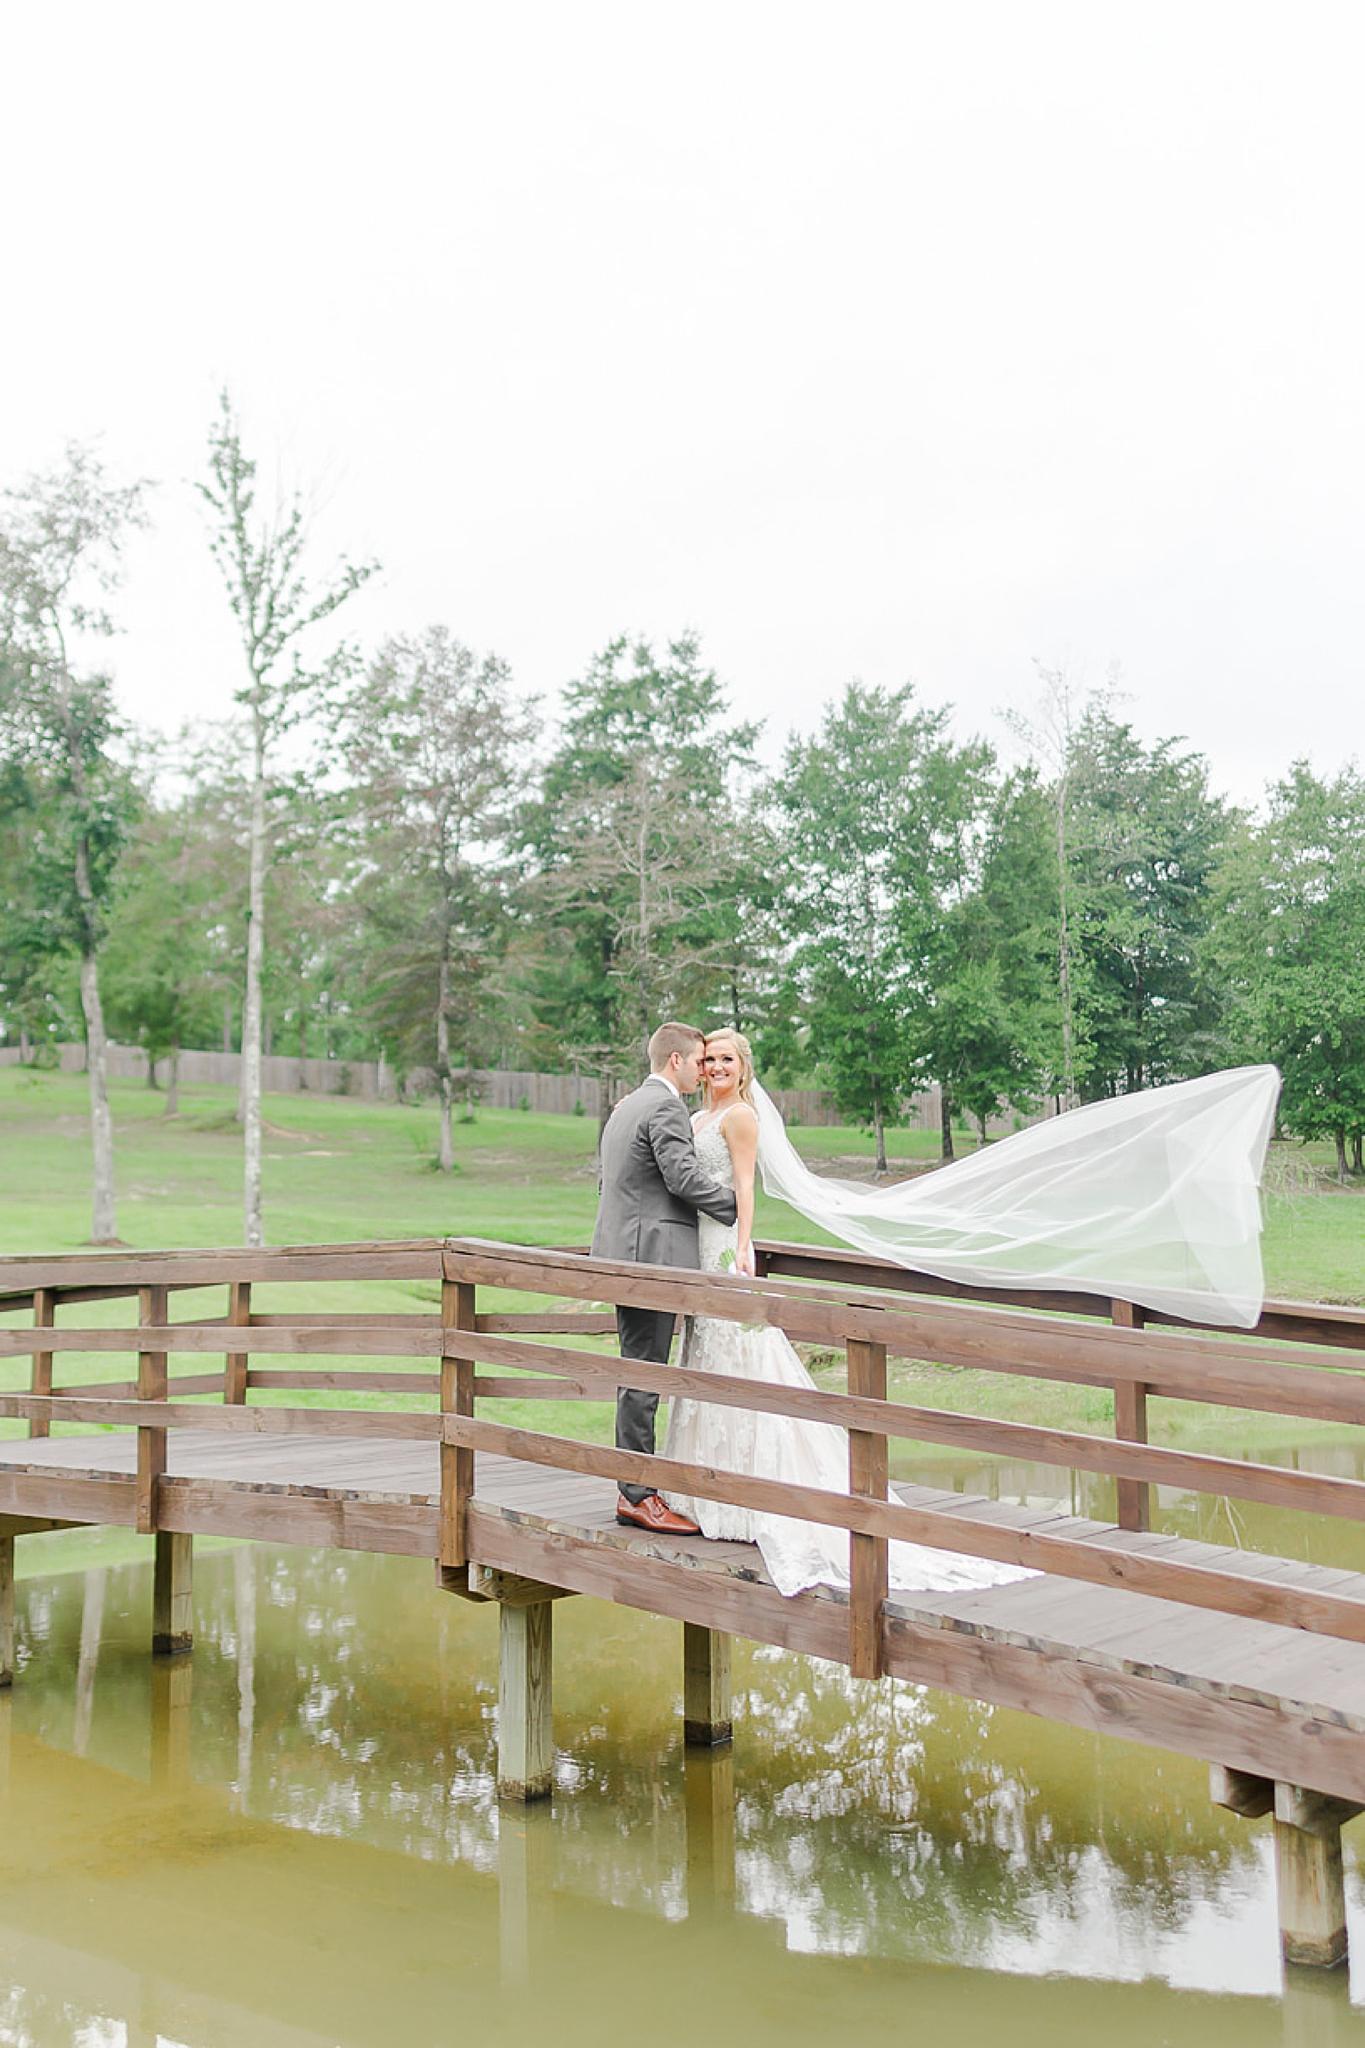 bride and groom kiss on bridge during Izenstone wedding day